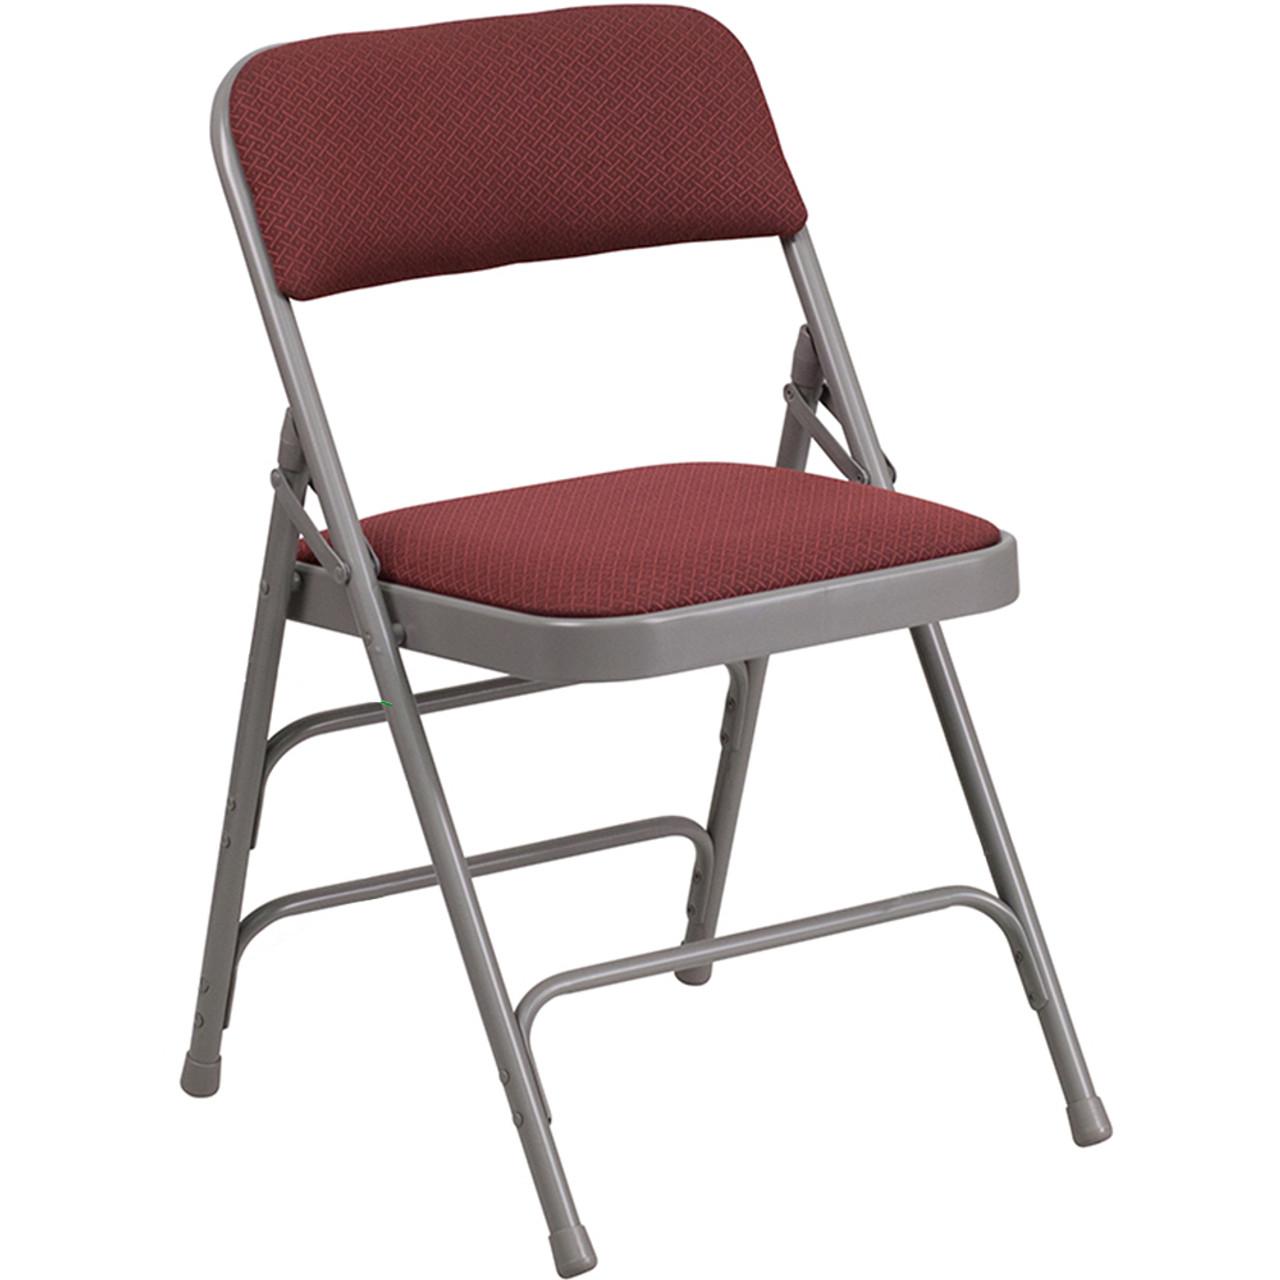 Fantastic Advantage Grey Padded Folding Chair Pattern Burgundy 1 In Fabric Seat Aw Mc309Af Bg Gg Theyellowbook Wood Chair Design Ideas Theyellowbookinfo